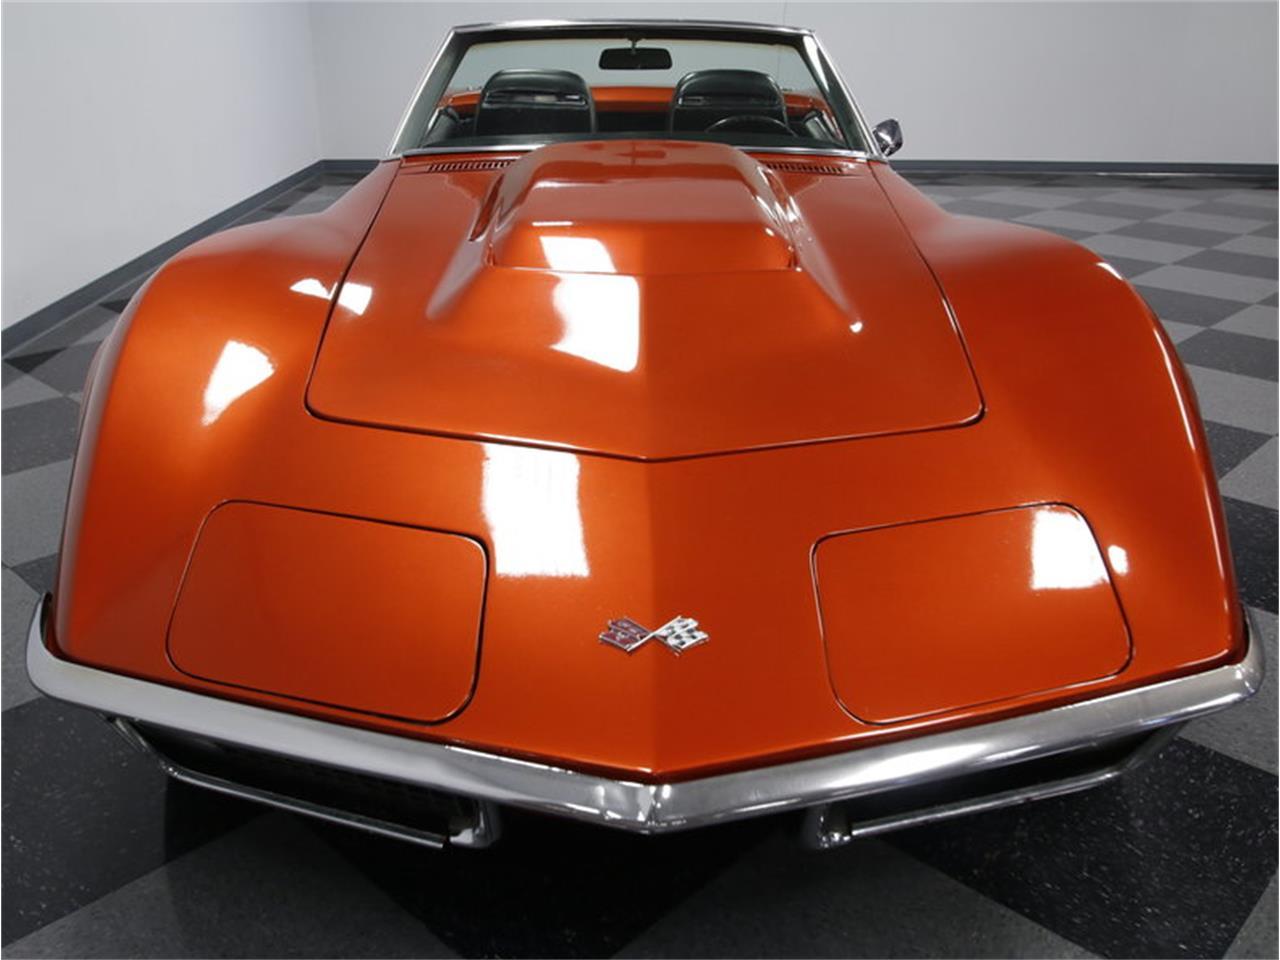 Large Picture of Classic '70 Chevrolet Corvette located in Concord North Carolina - $27,995.00 Offered by Streetside Classics - Charlotte - JTQZ